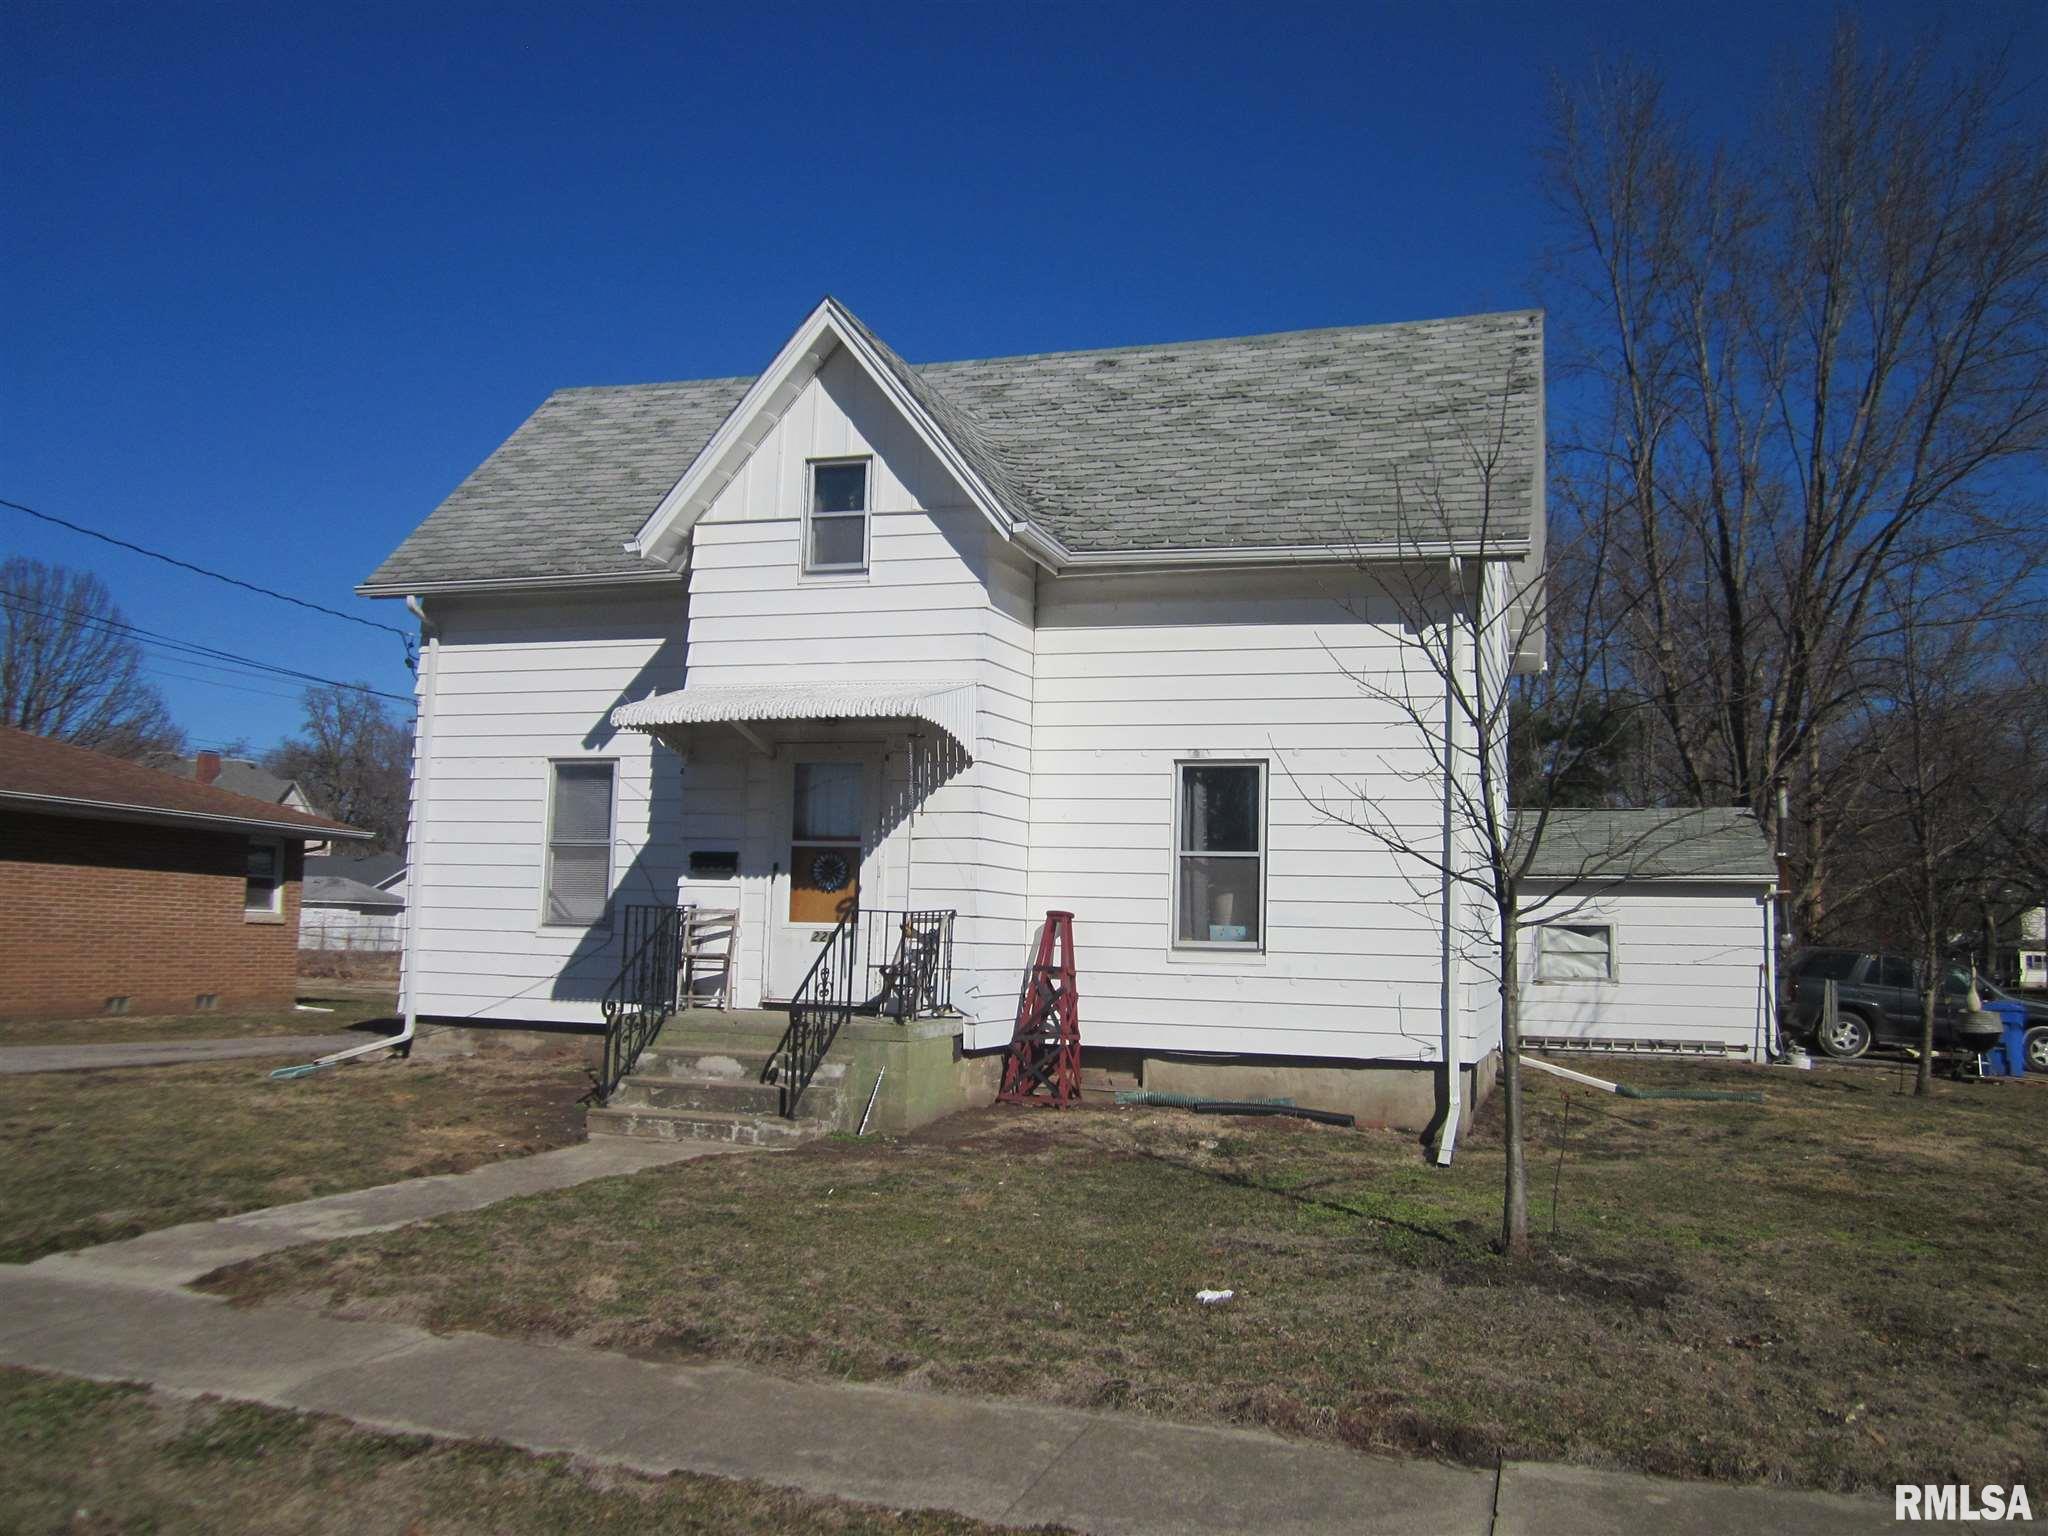 220 E WALNUT Property Photo - Mason City, IL real estate listing